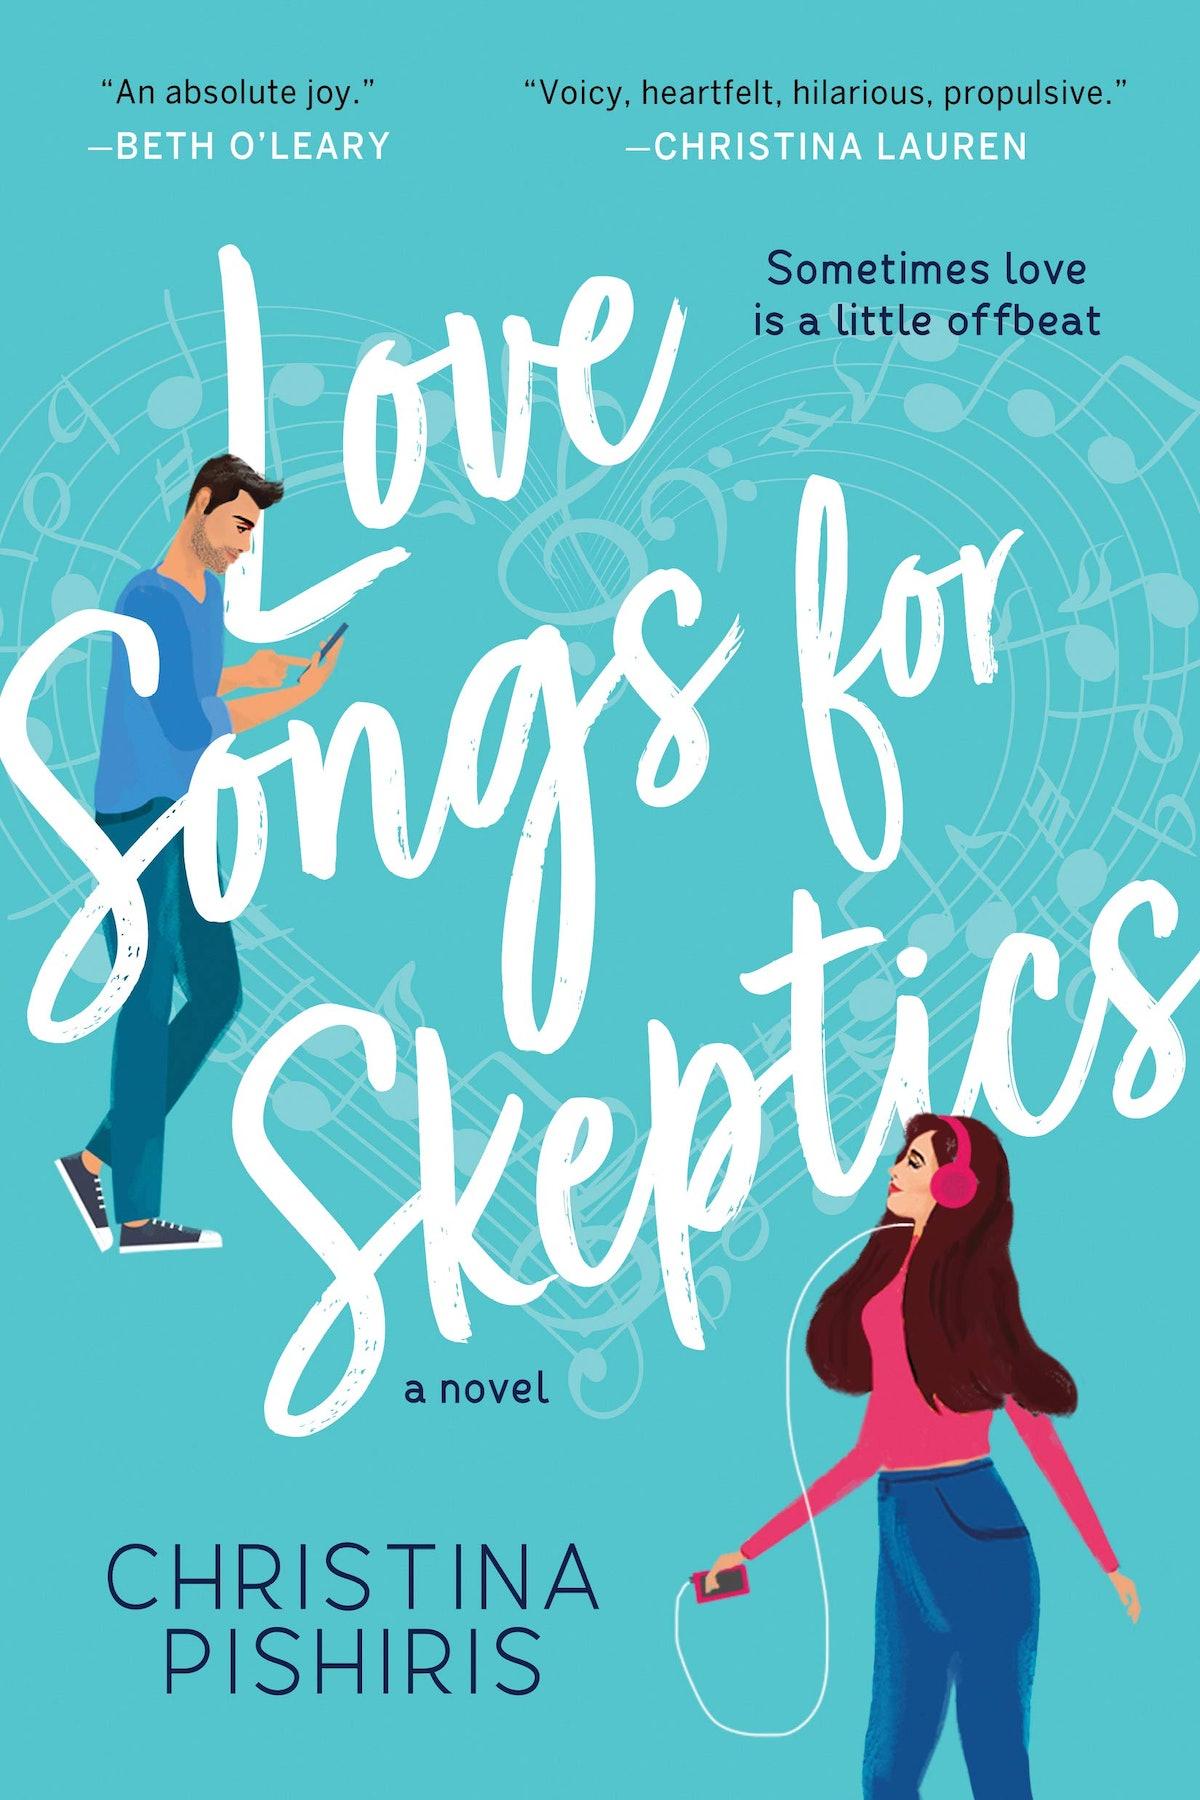 'Love Songs for Skeptics: A Novel' by Christina Pishiris